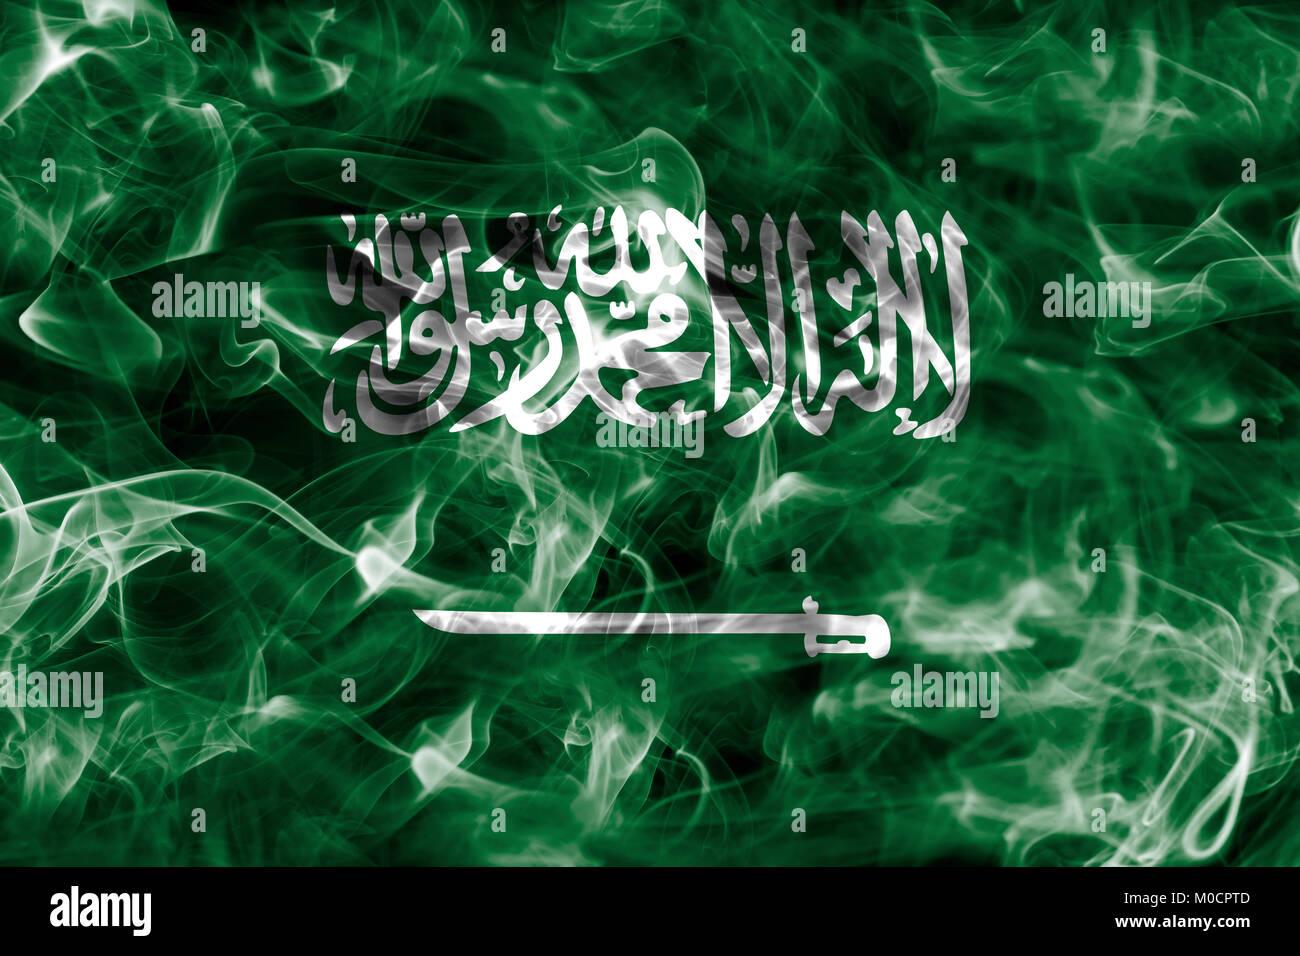 Saudi Arabia smoke flag - Stock Image